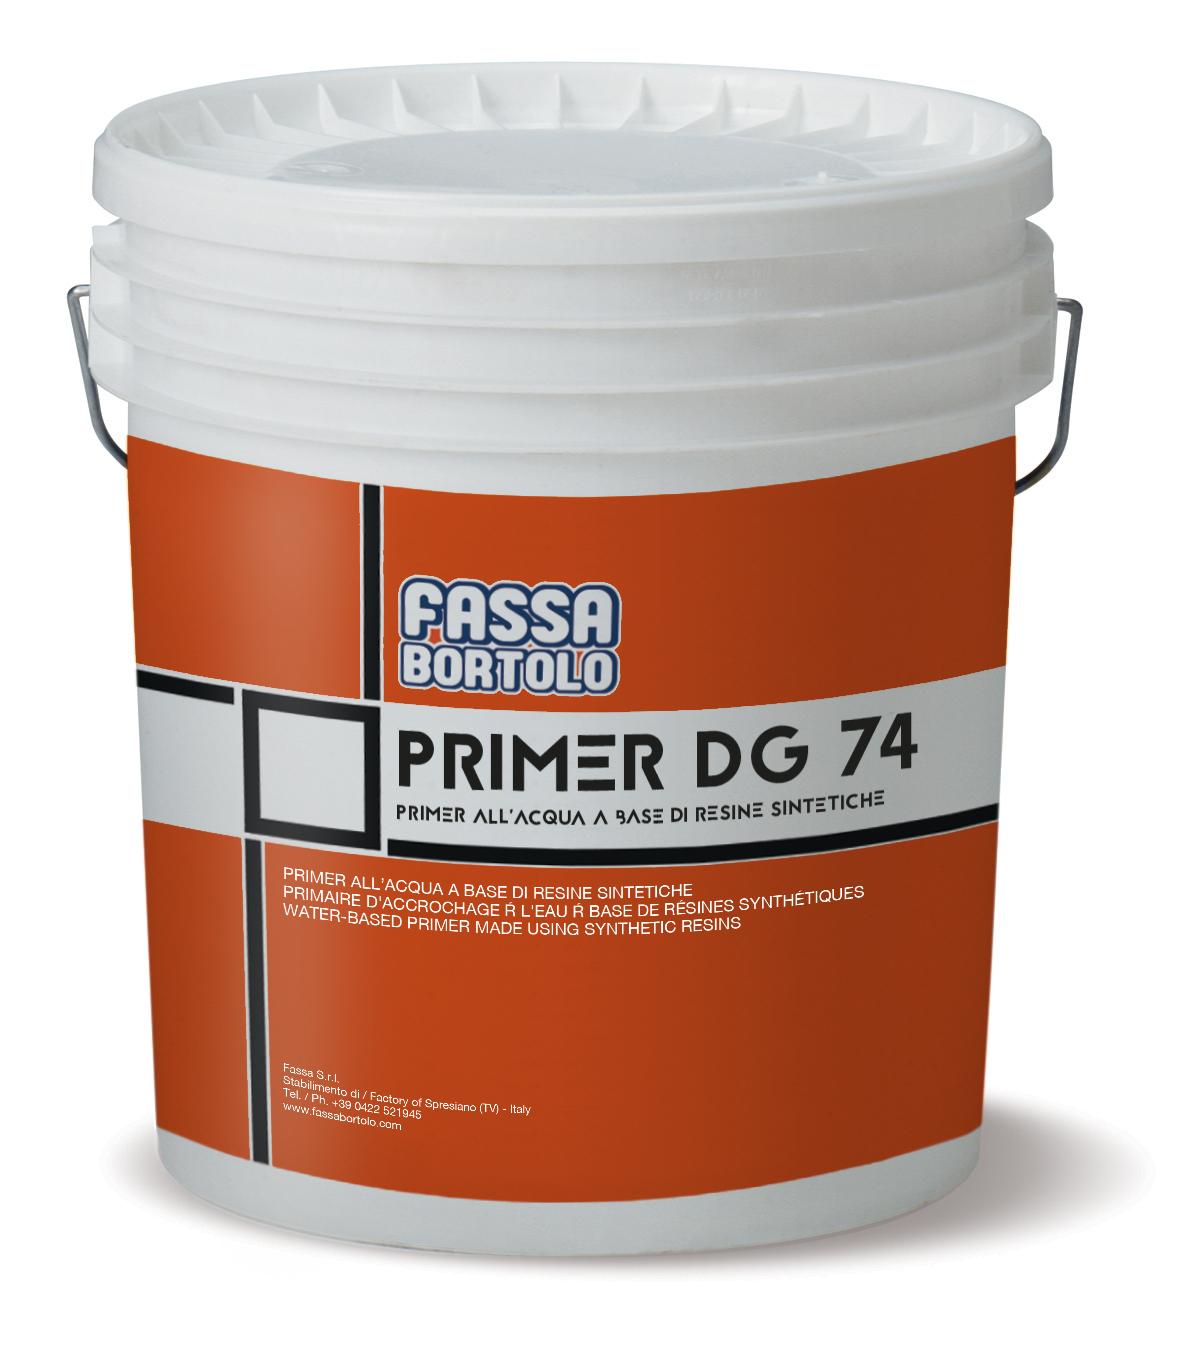 PRIMER DG 74